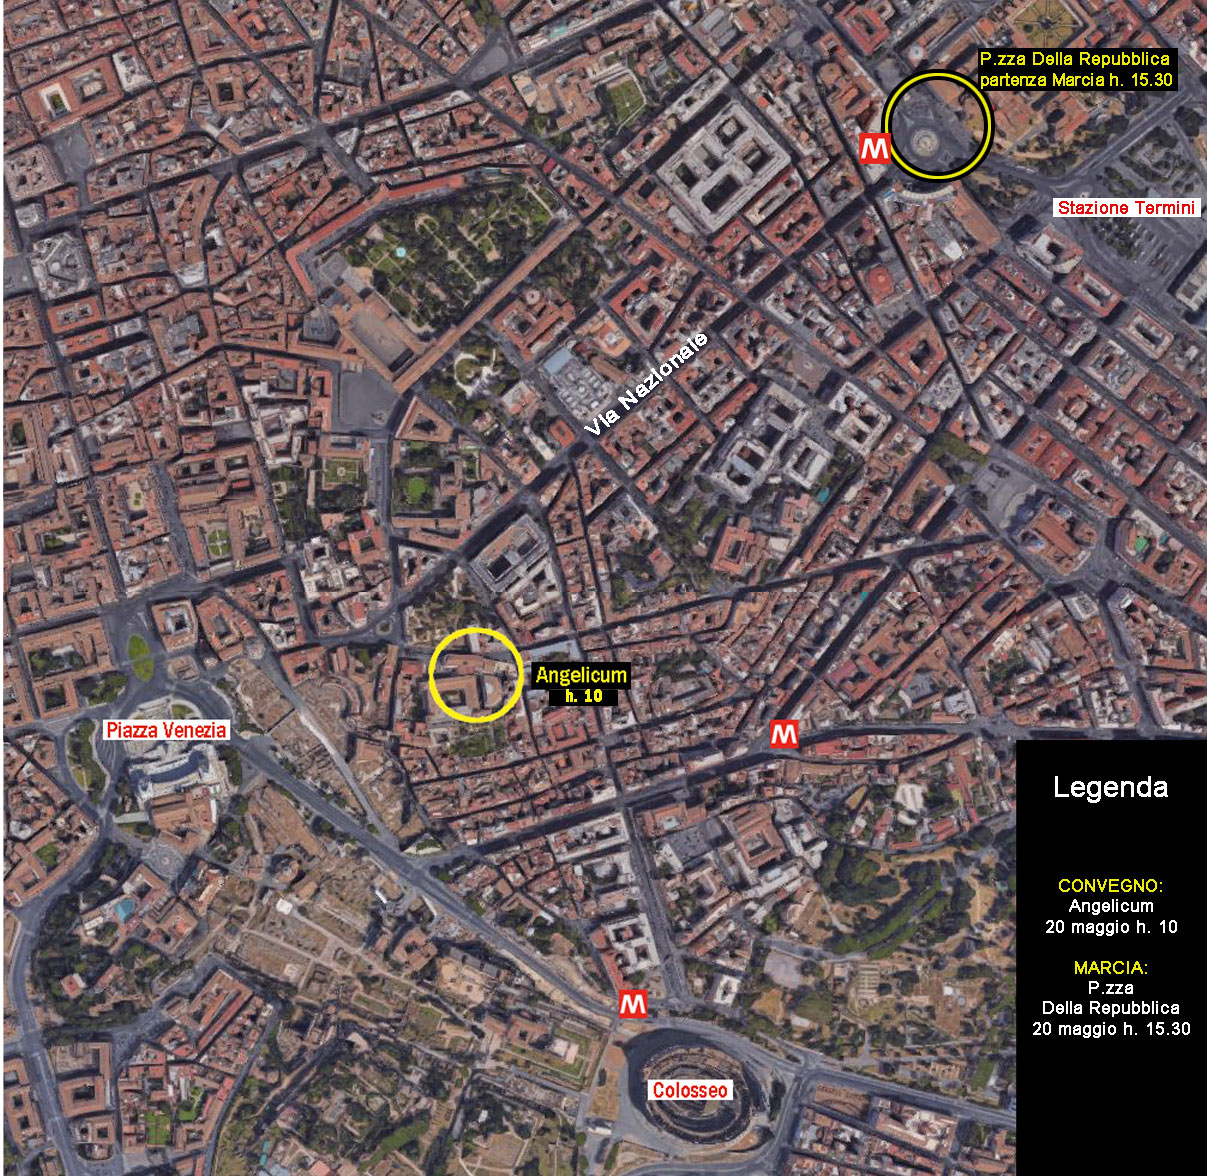 Mappa_Angelicum_e_Marcia